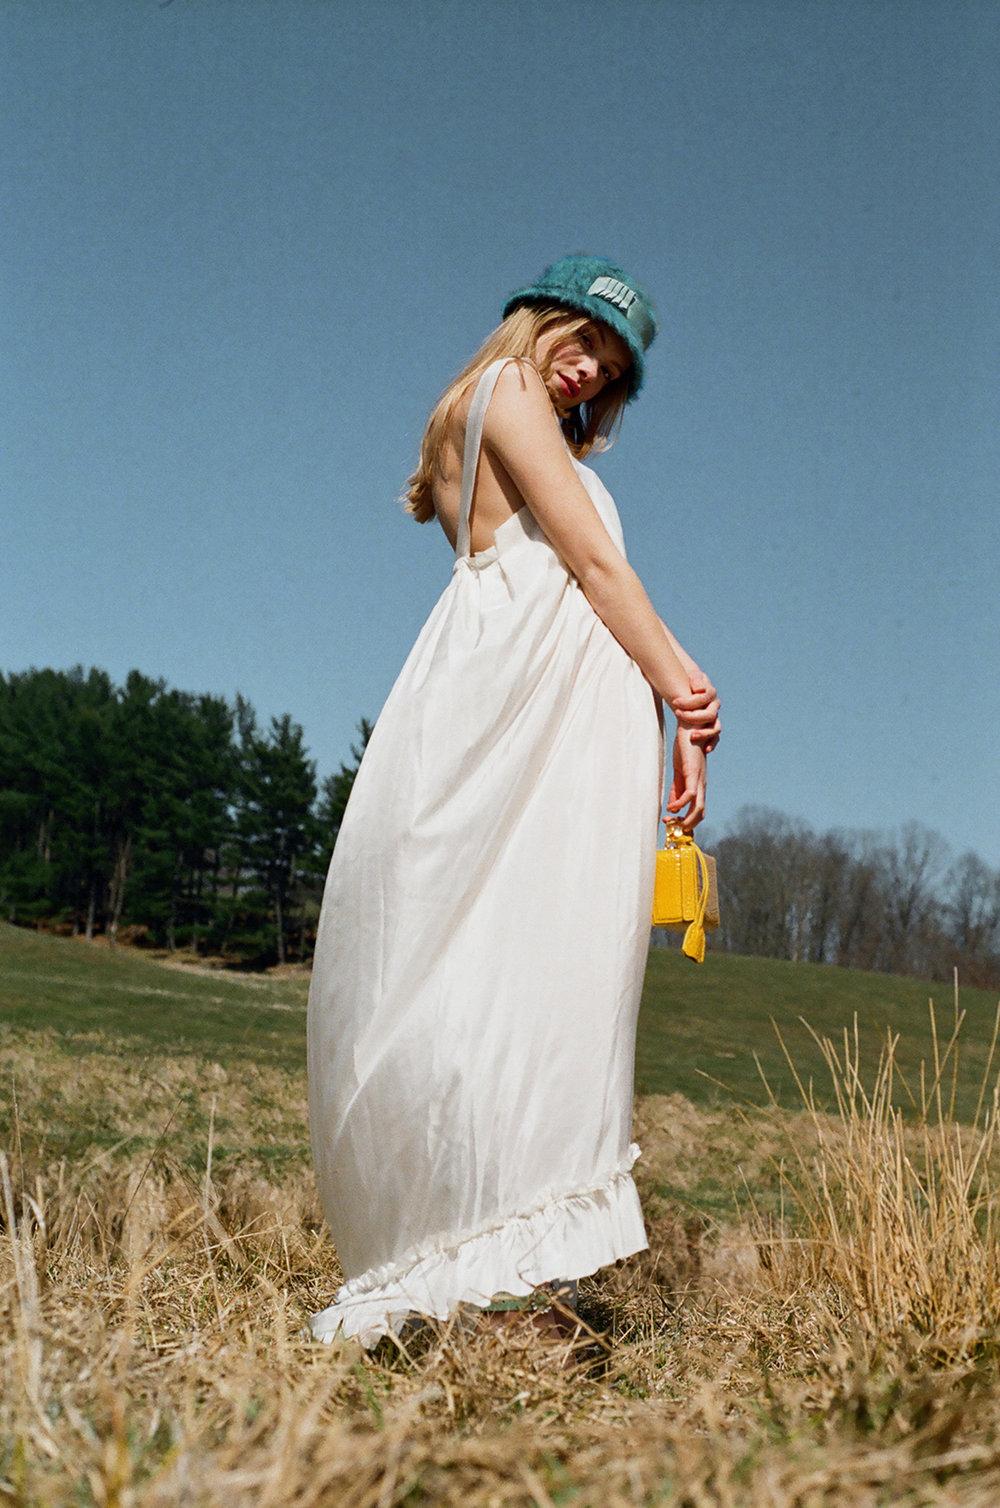 Hat,Albertus Swanepoel. Dress, Wendy Nichol. Bag, Mark Cross.